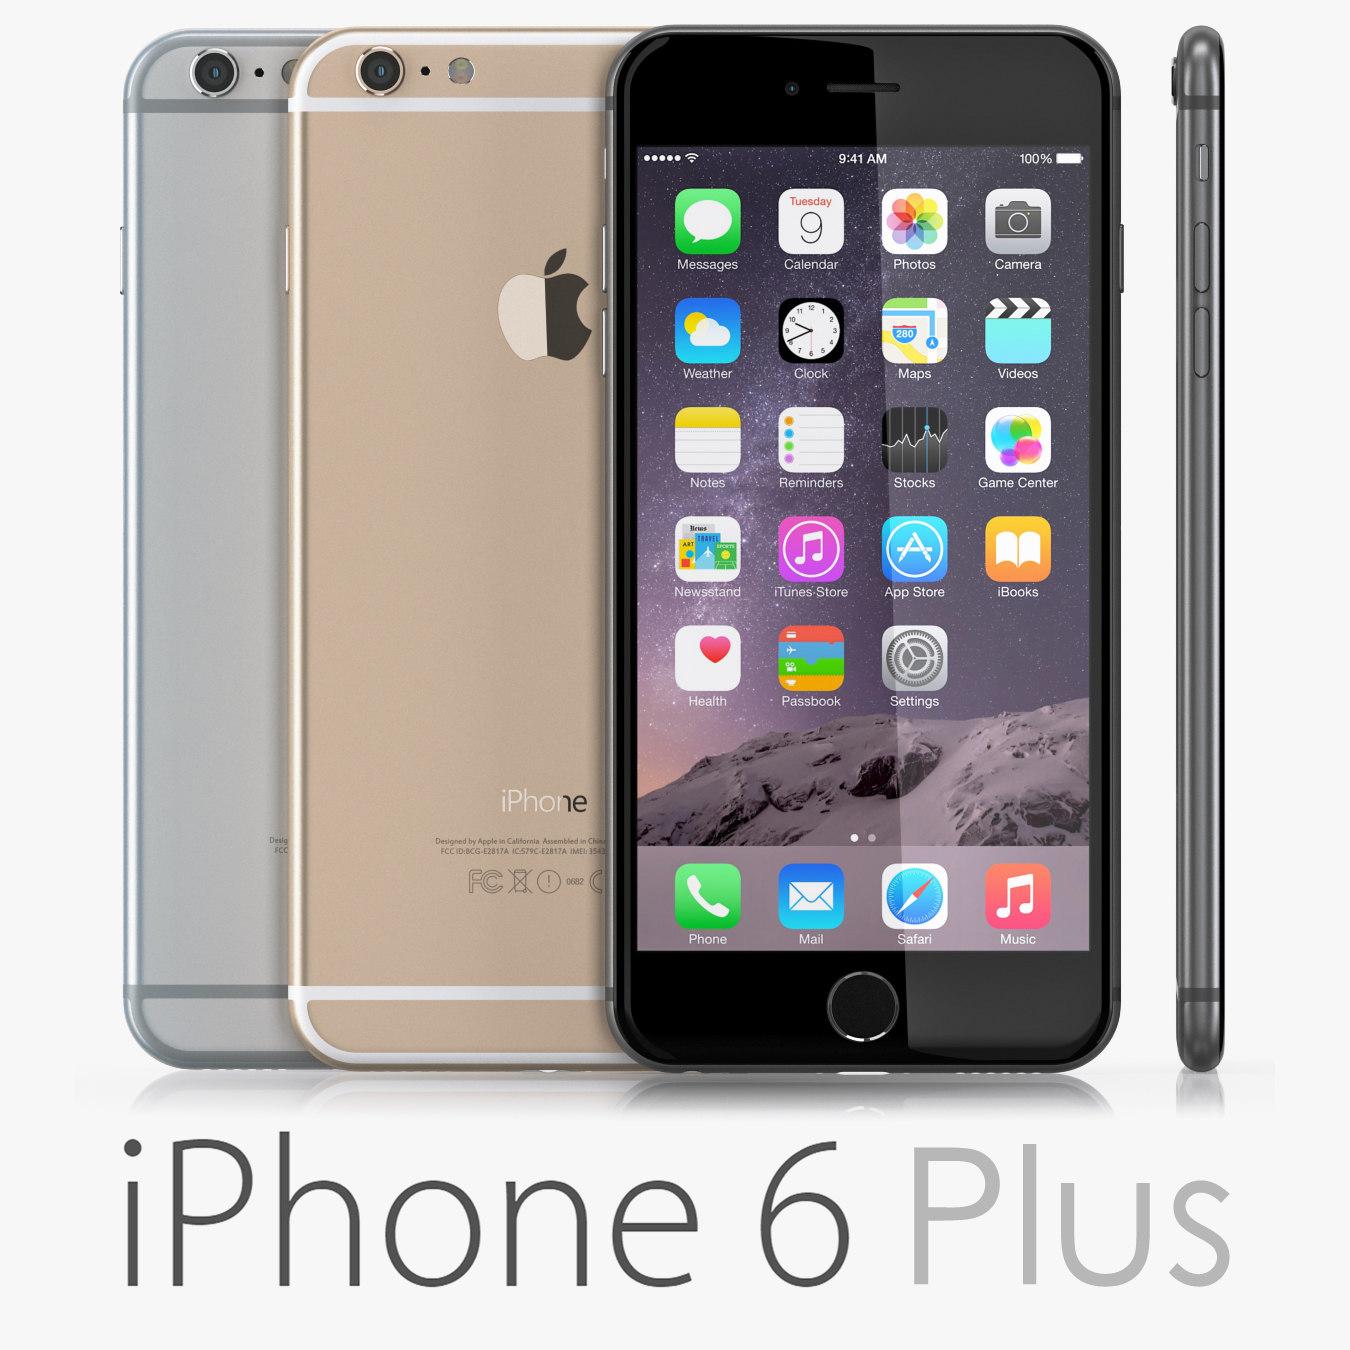 iphone_6_plus_all_01.jpg